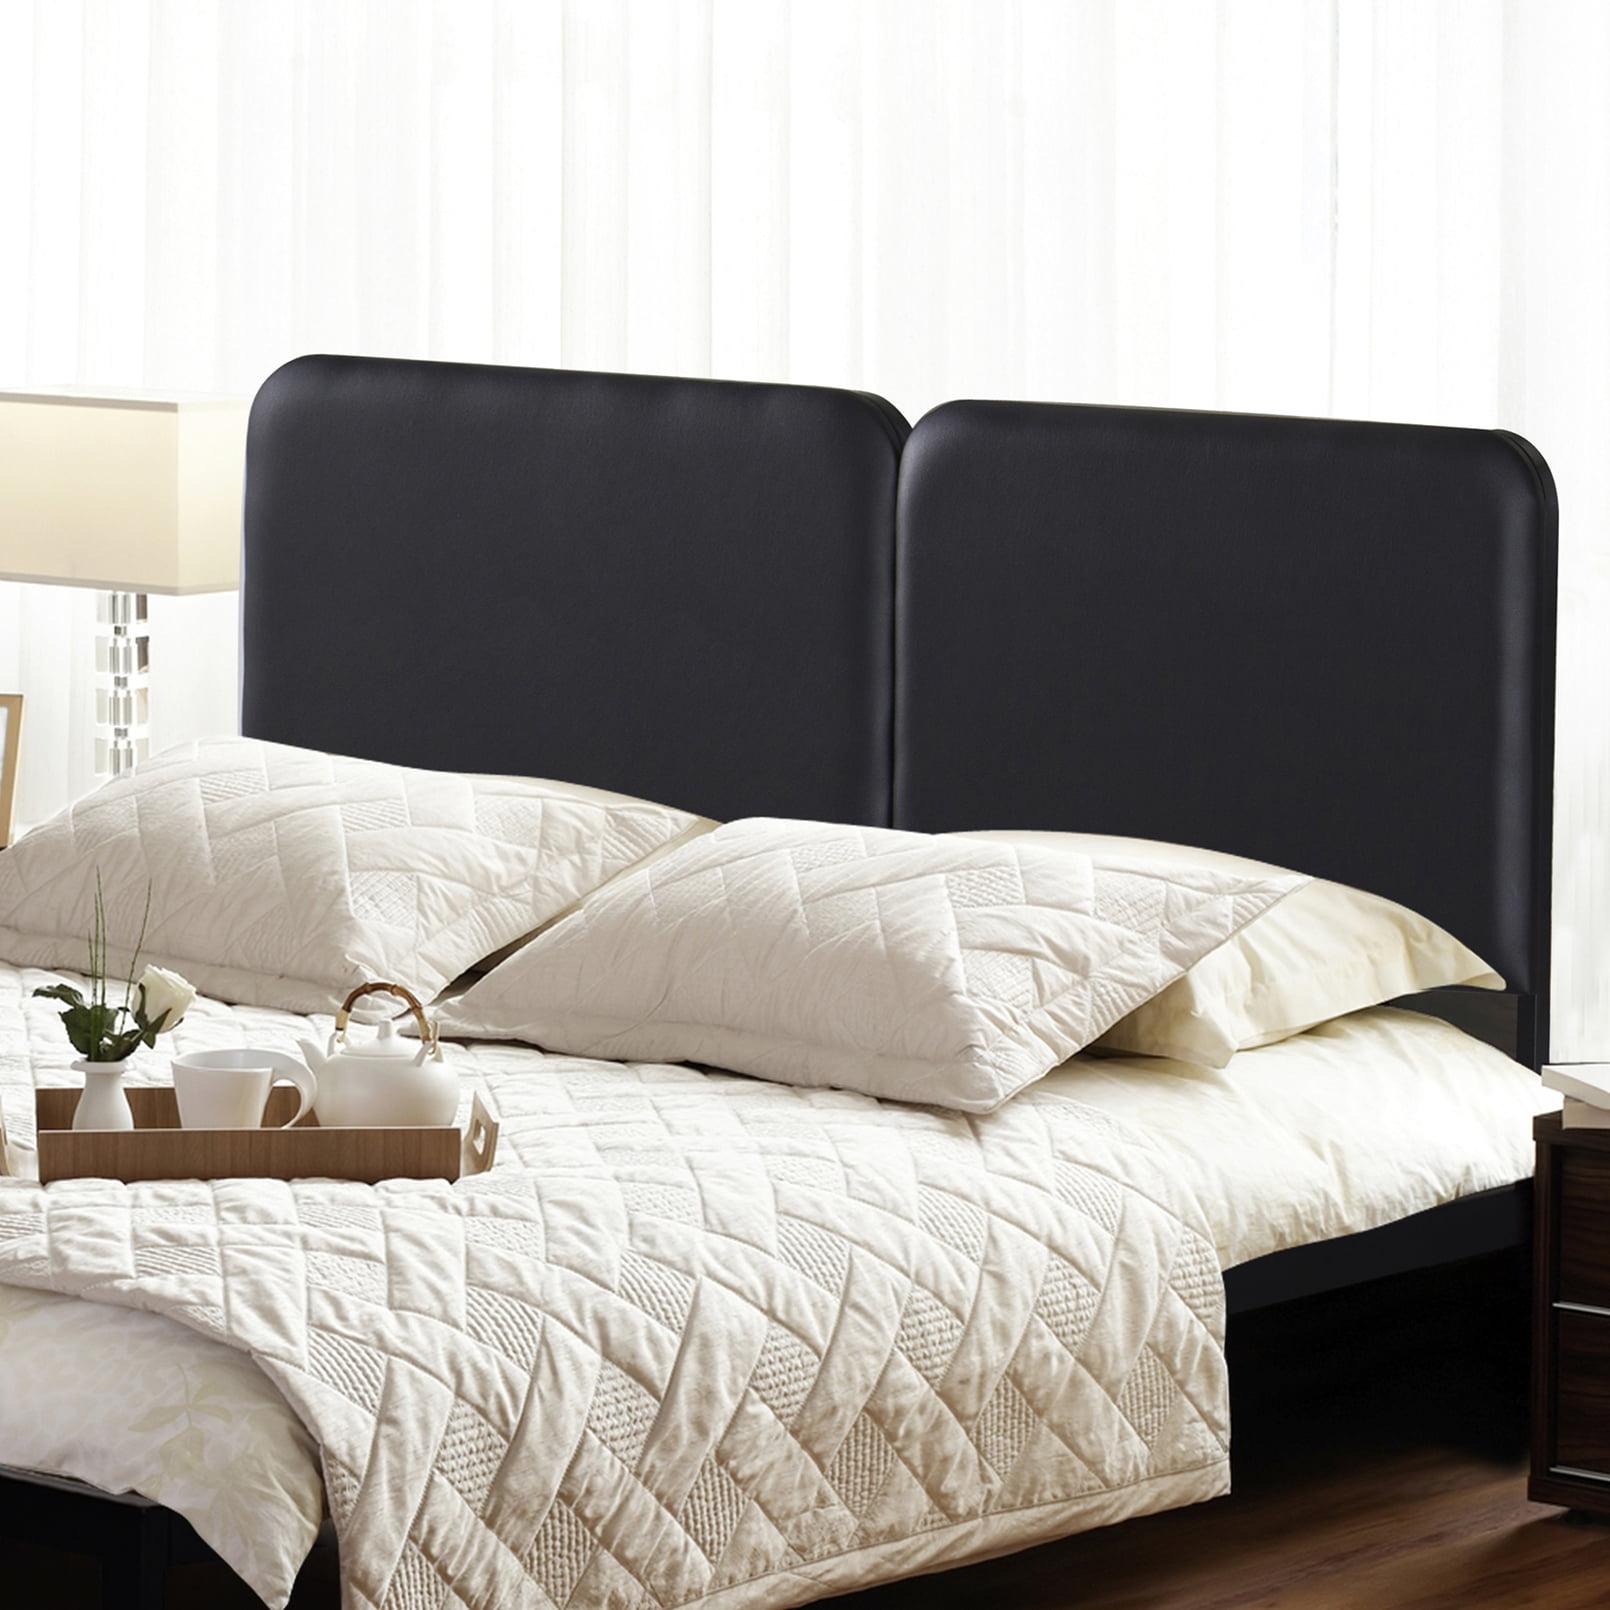 GranRest Upholstered Faux Leather Headboard Steel Simple Black, Full